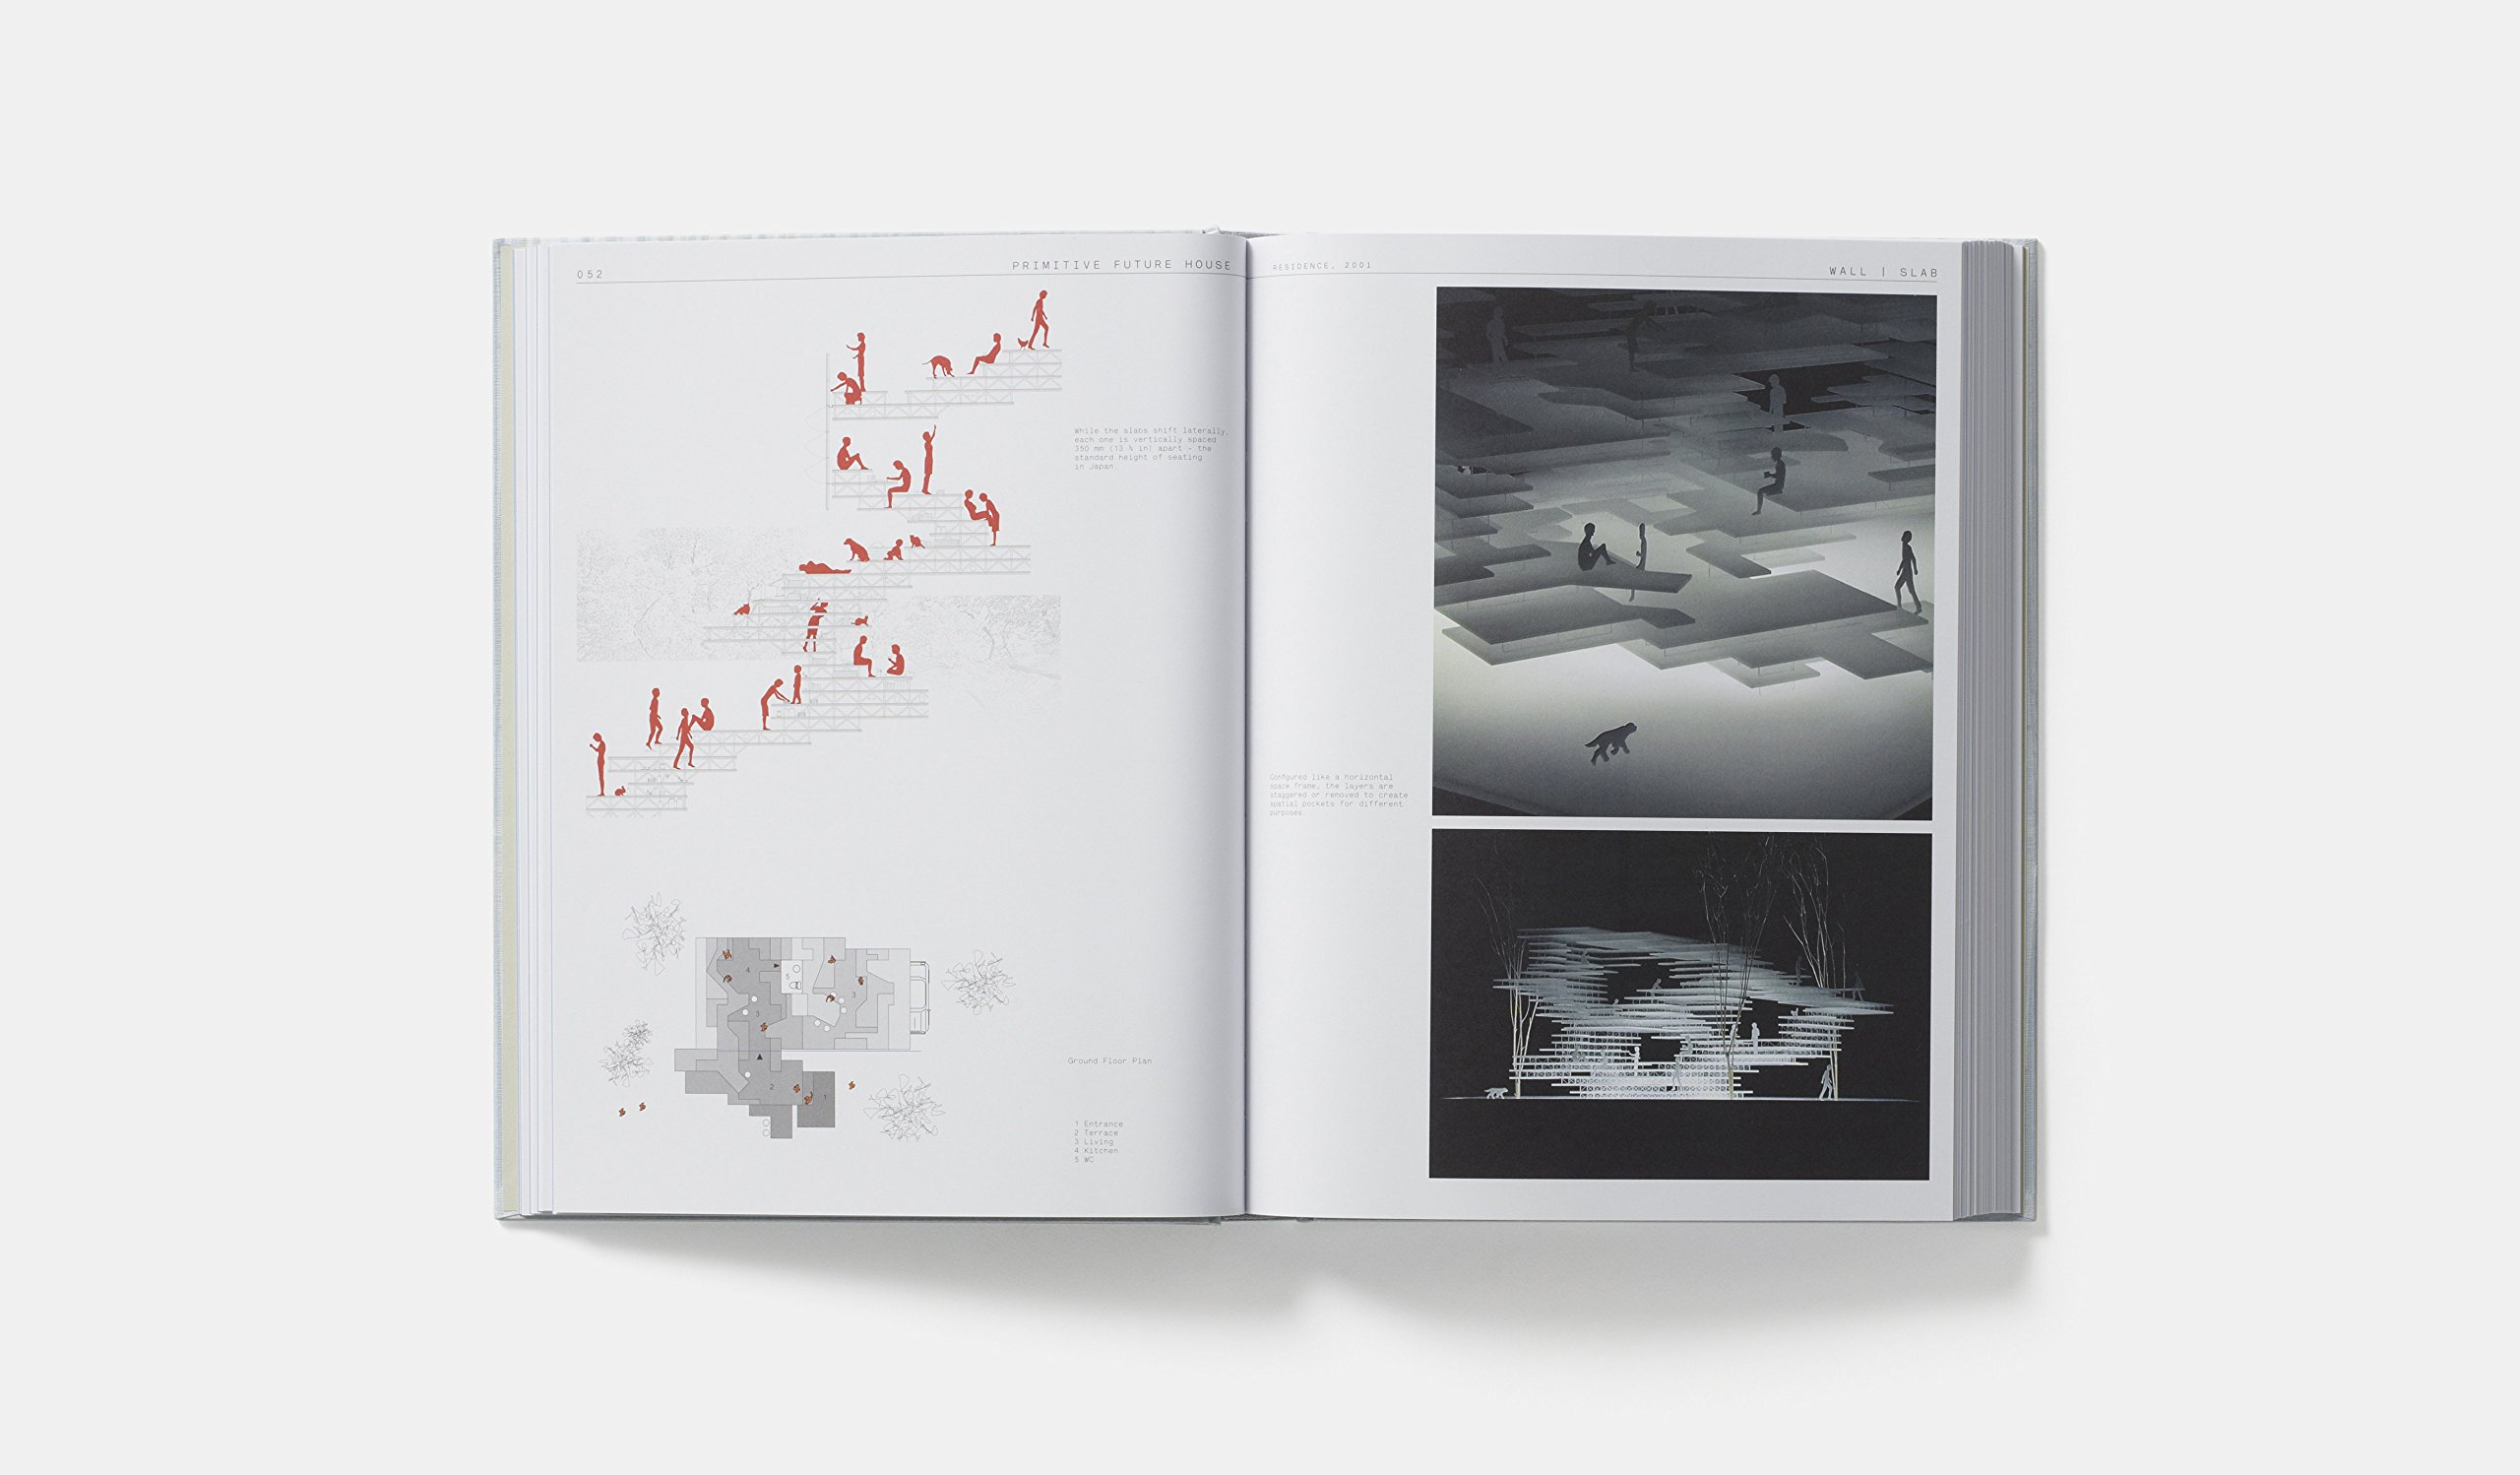 Gut Sou Fujimoto: Amazon.de: Naomi Pollock: Fremdsprachige Bücher